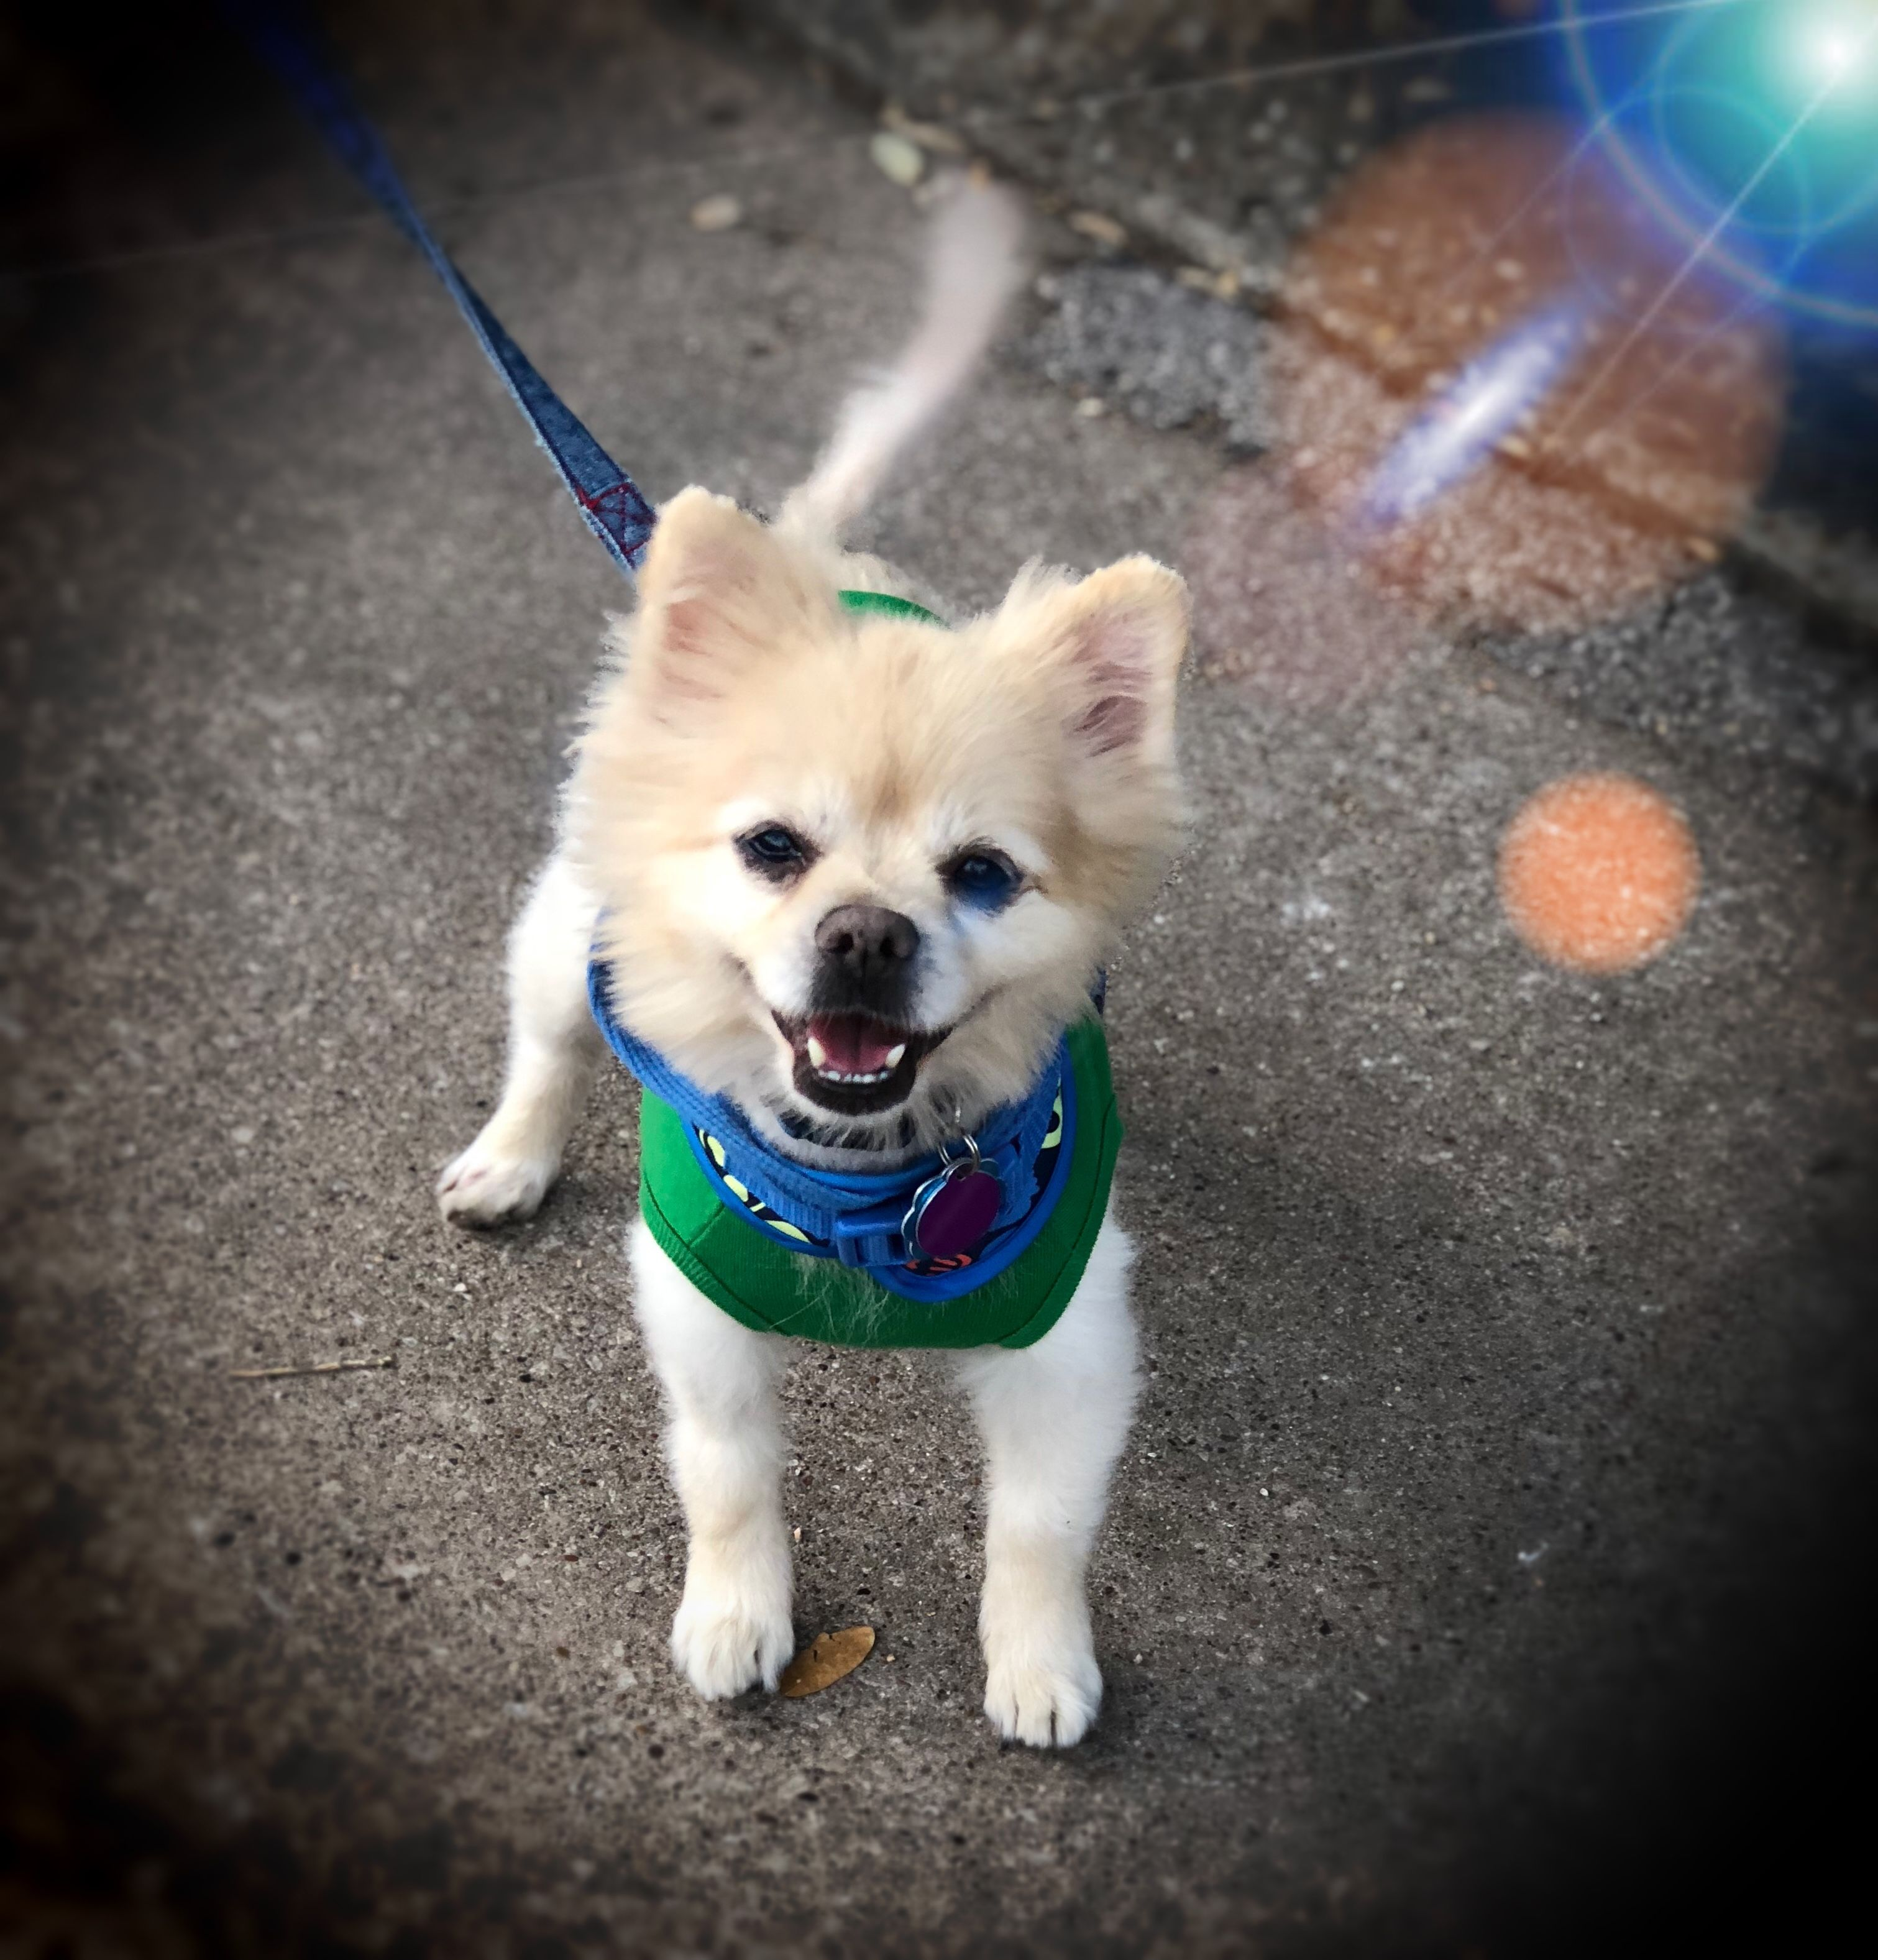 Pomeranian dog for Adoption in Garland, TX. ADN805816 on